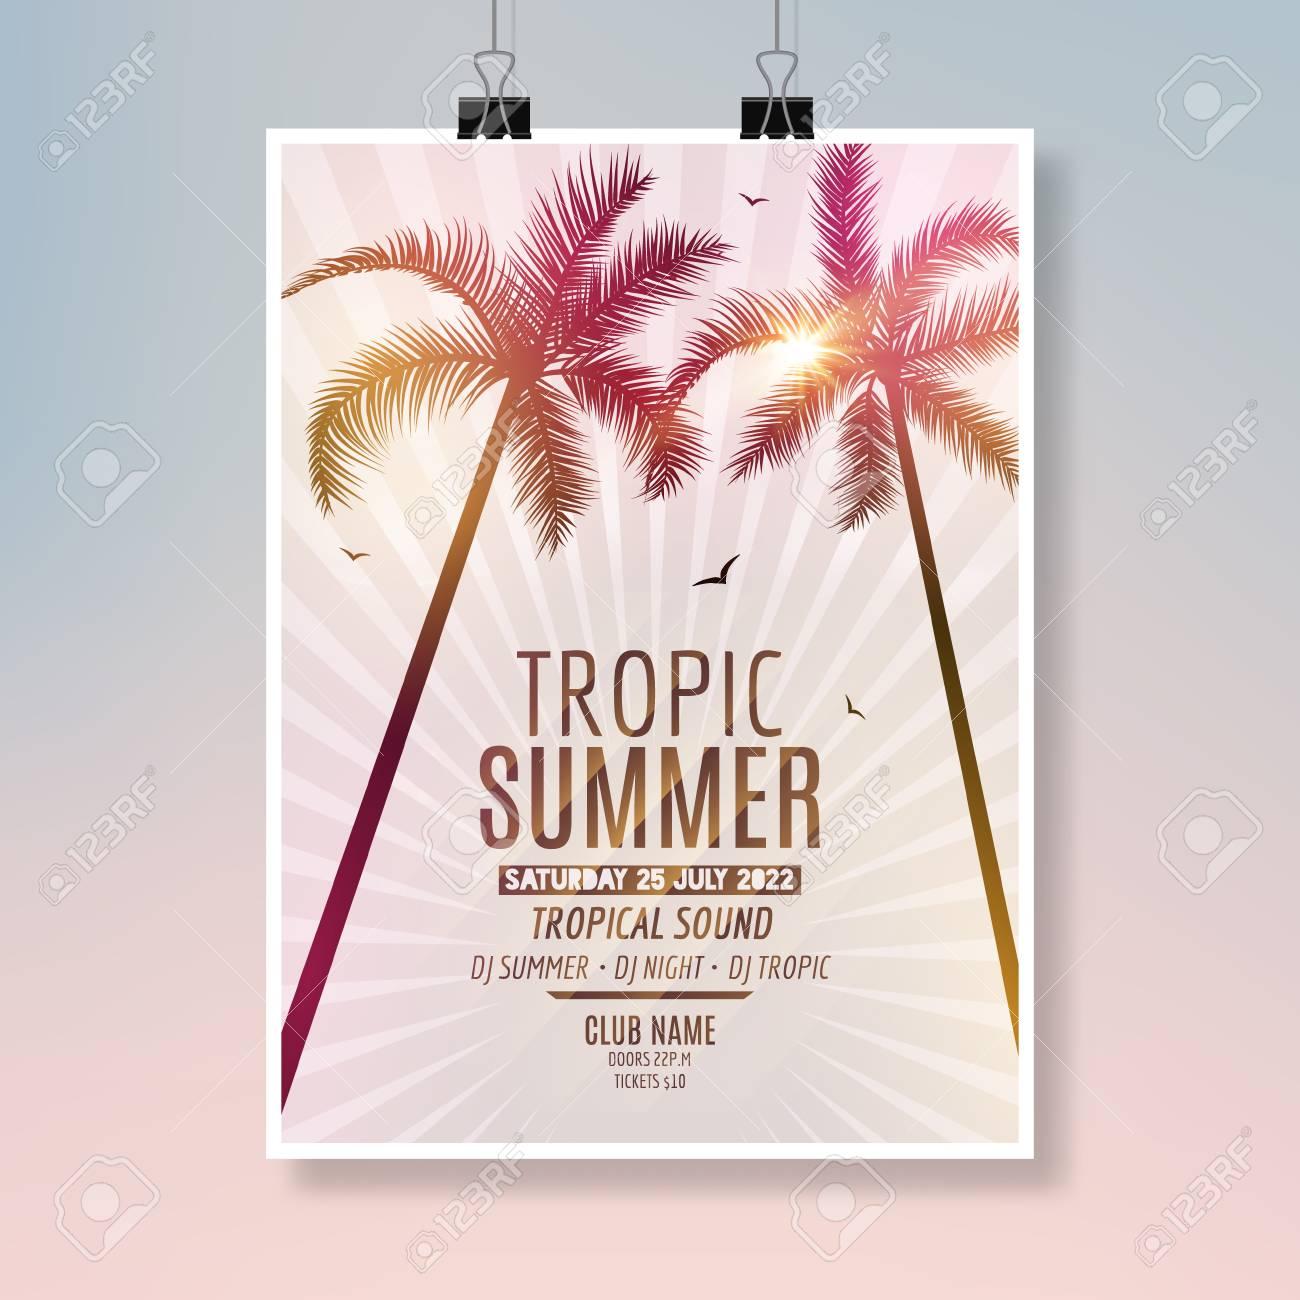 tropic summer beach party flyer design poster summer vacation template stock vector 80872521